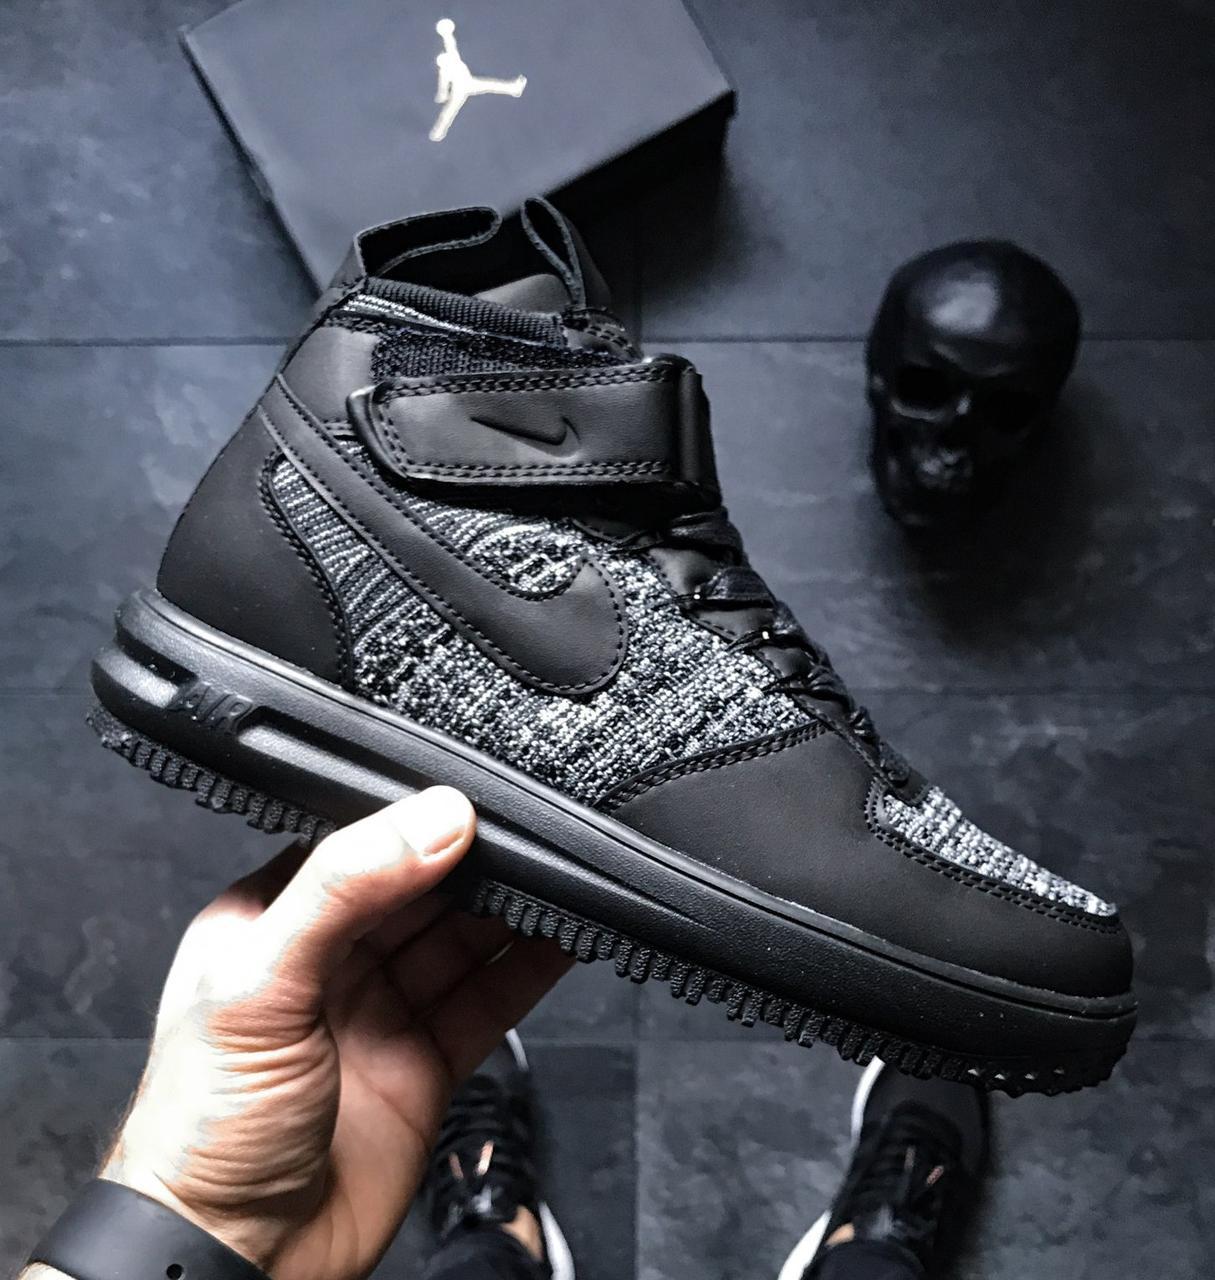 buy online f9973 12cf7 Мужские кроссовки Nike Lunar Force 1 Flyknit Workboot Black Grey - Интернет-магазин  обуви